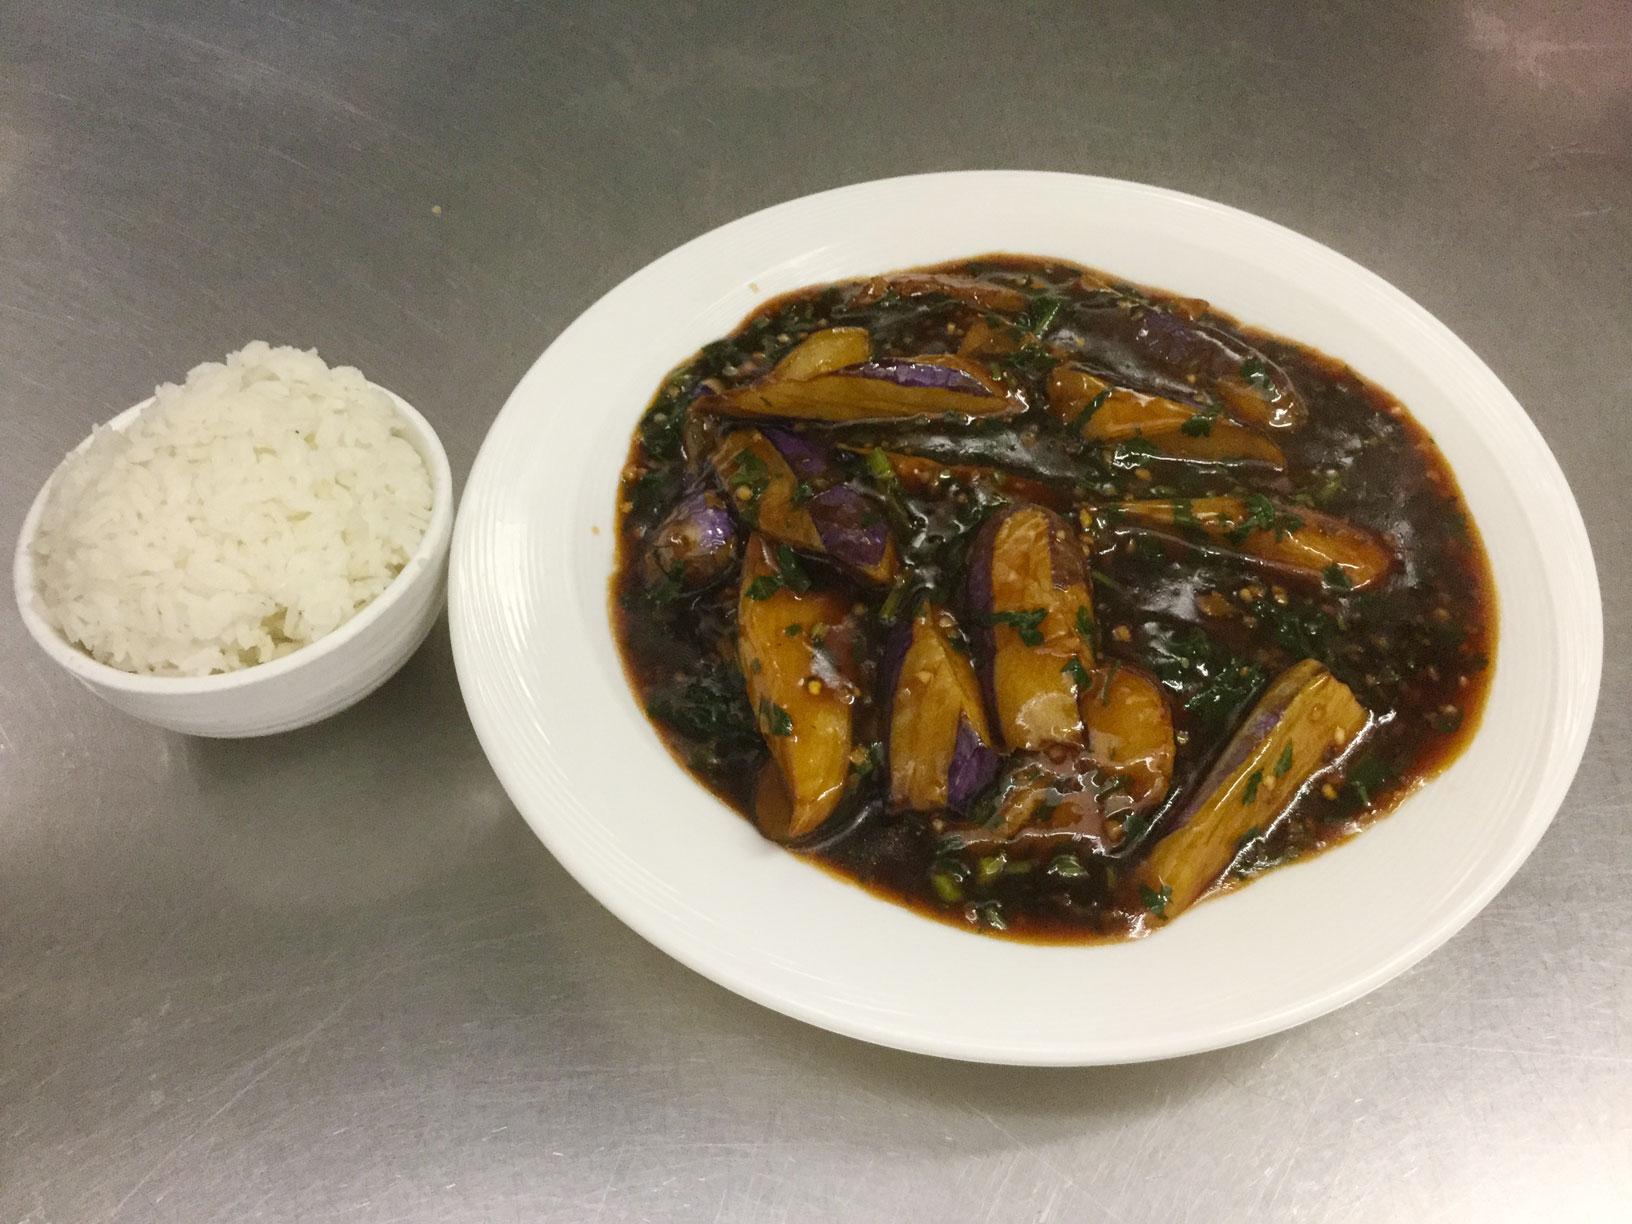 eggplant manchurian style